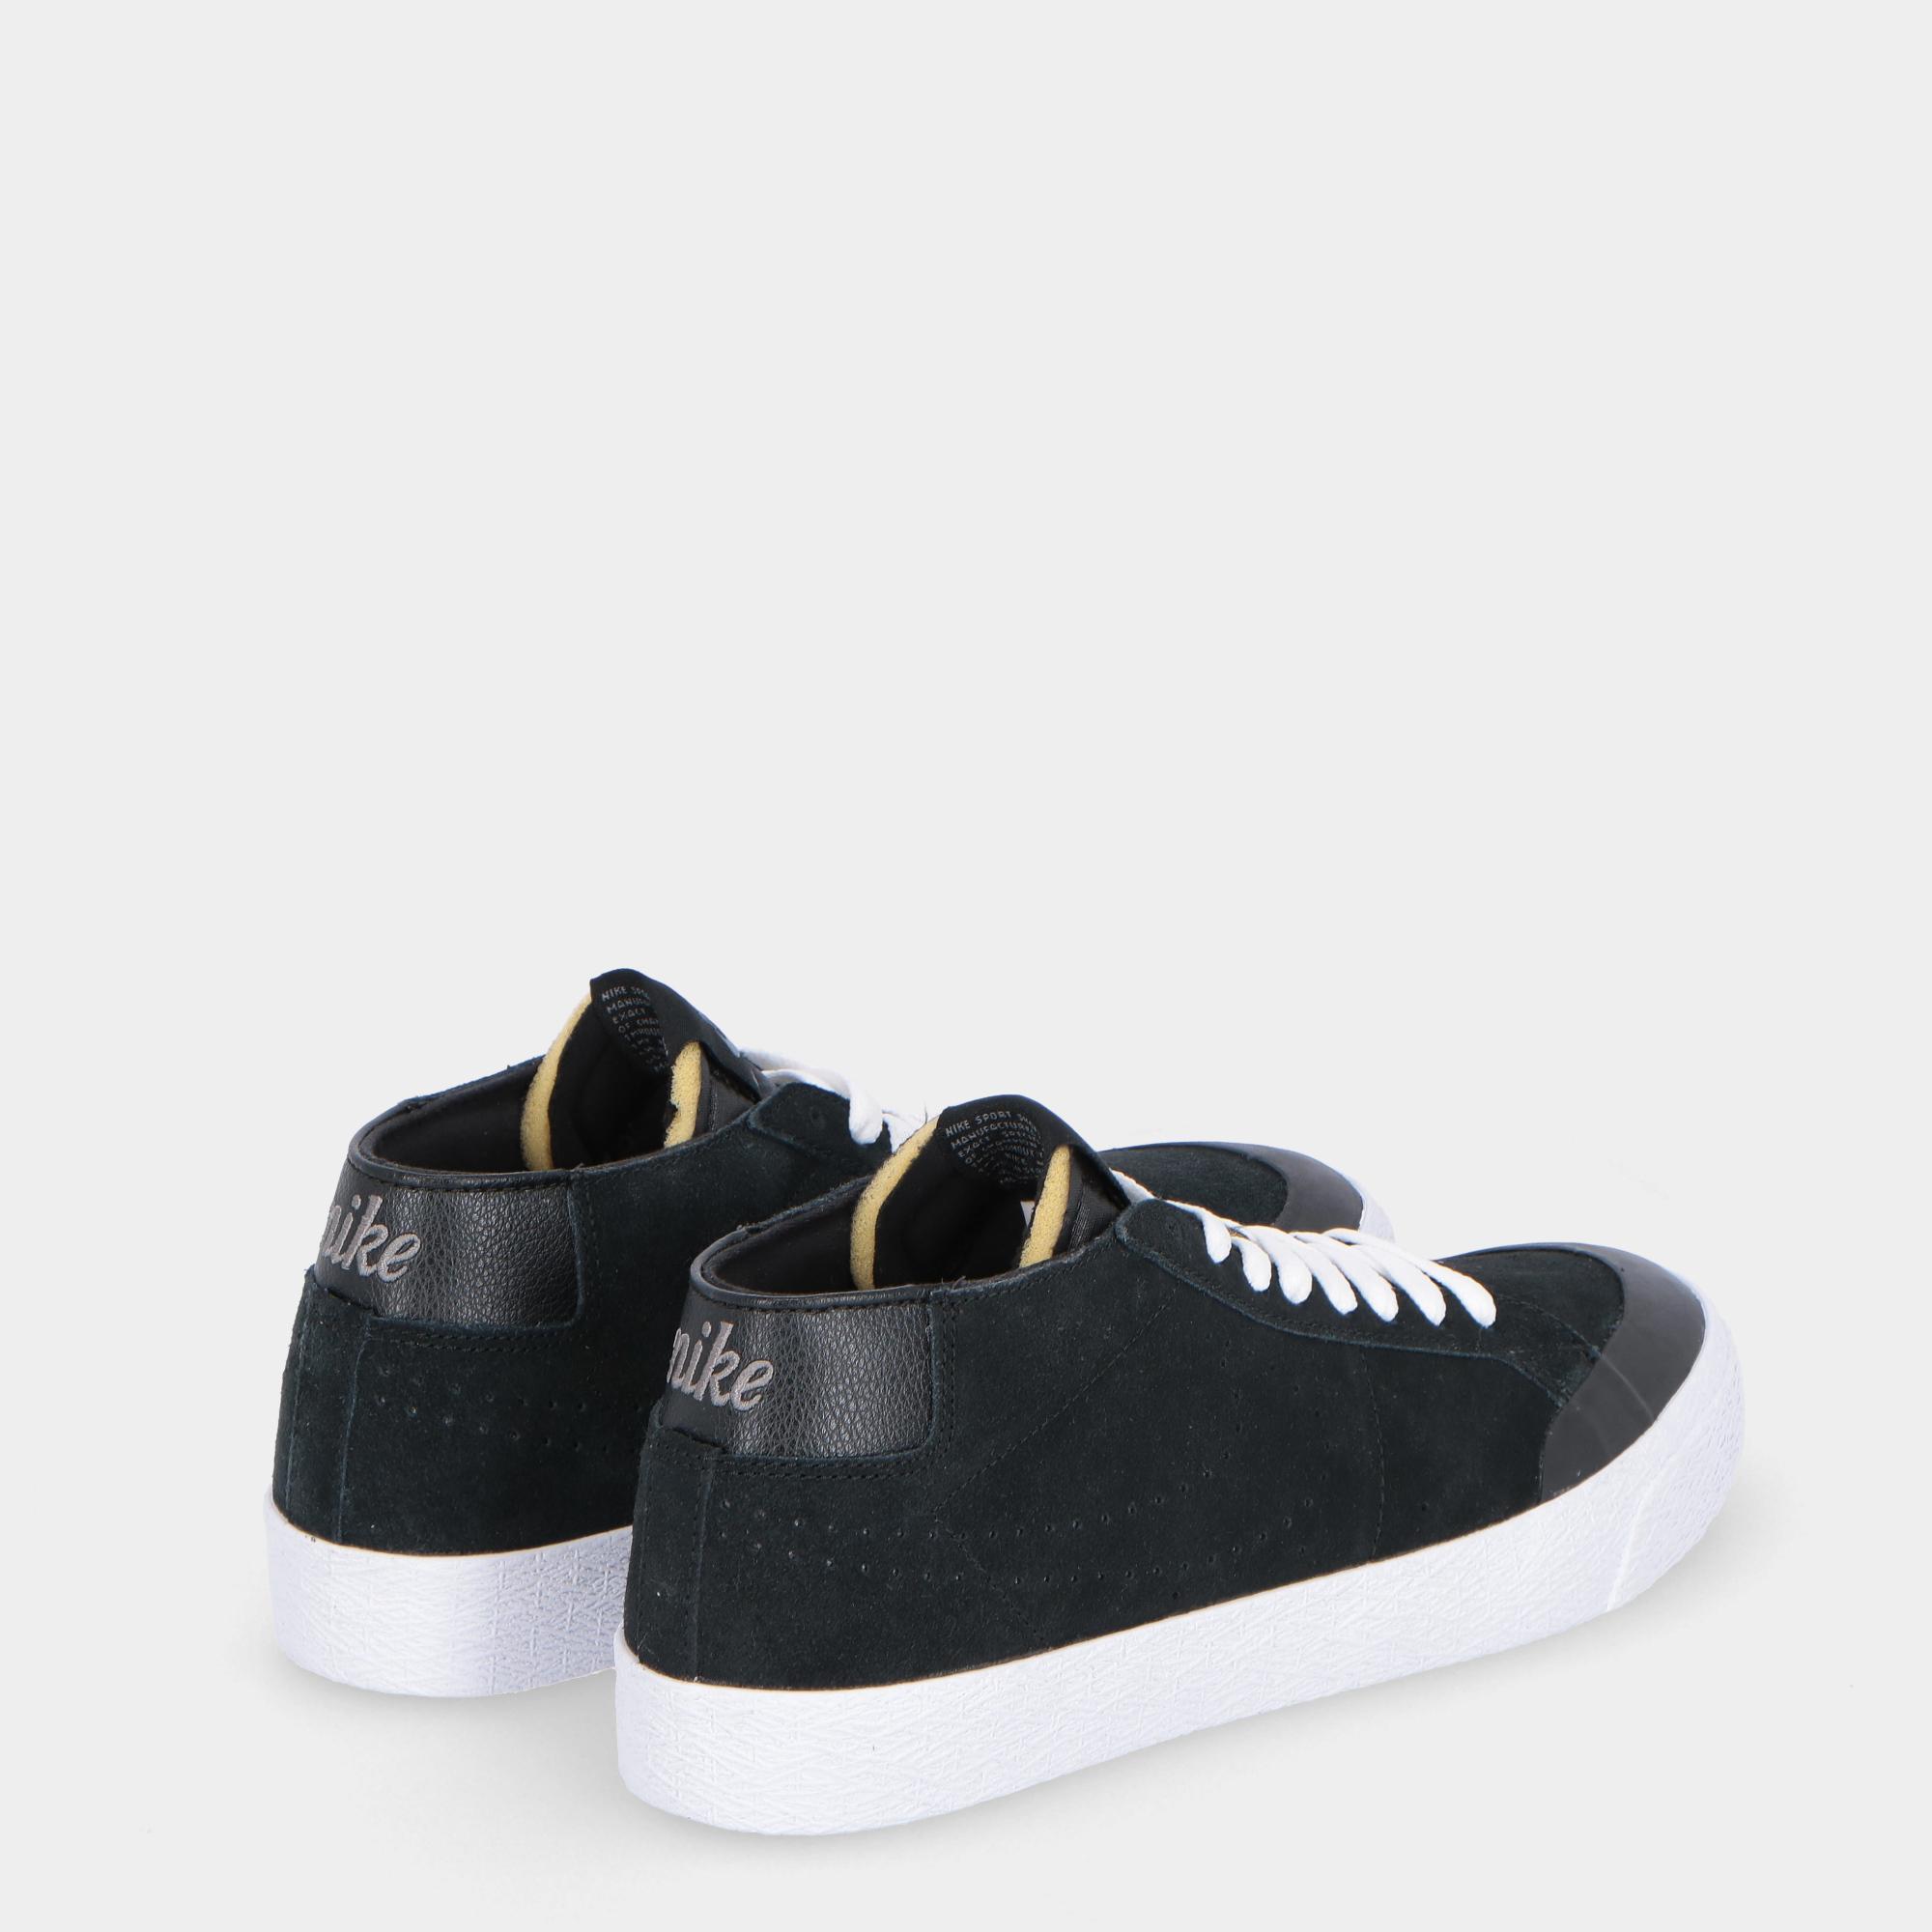 sports shoes 76267 0c626 NIKE SB ZOOM BLAZER CHUKKA XT